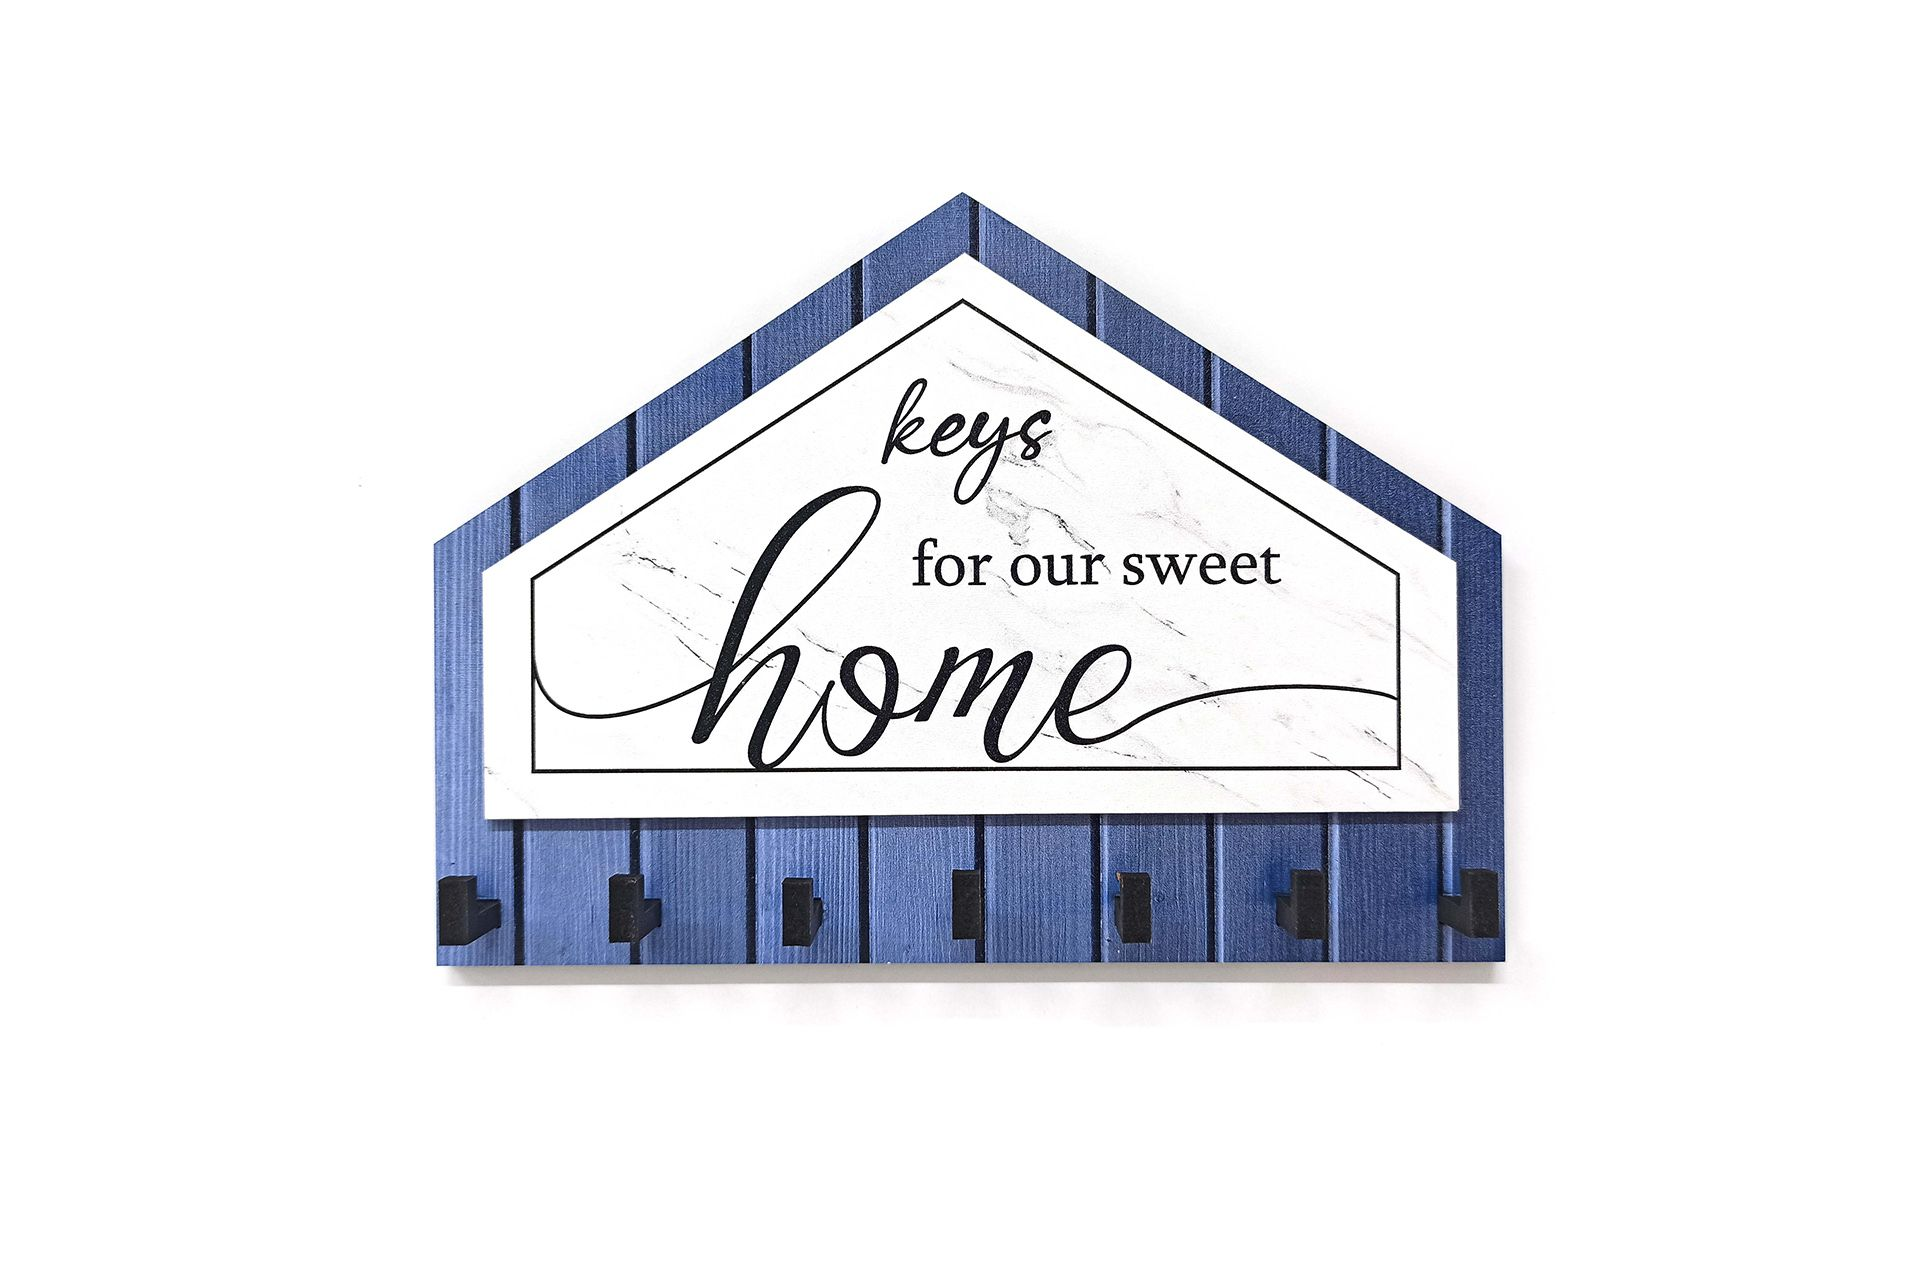 ÜÇGEN MAVİ SİYAH KEYS FOR HOME DEKORATİF AHŞAP ANAHTARLIK MODERN DEKOR